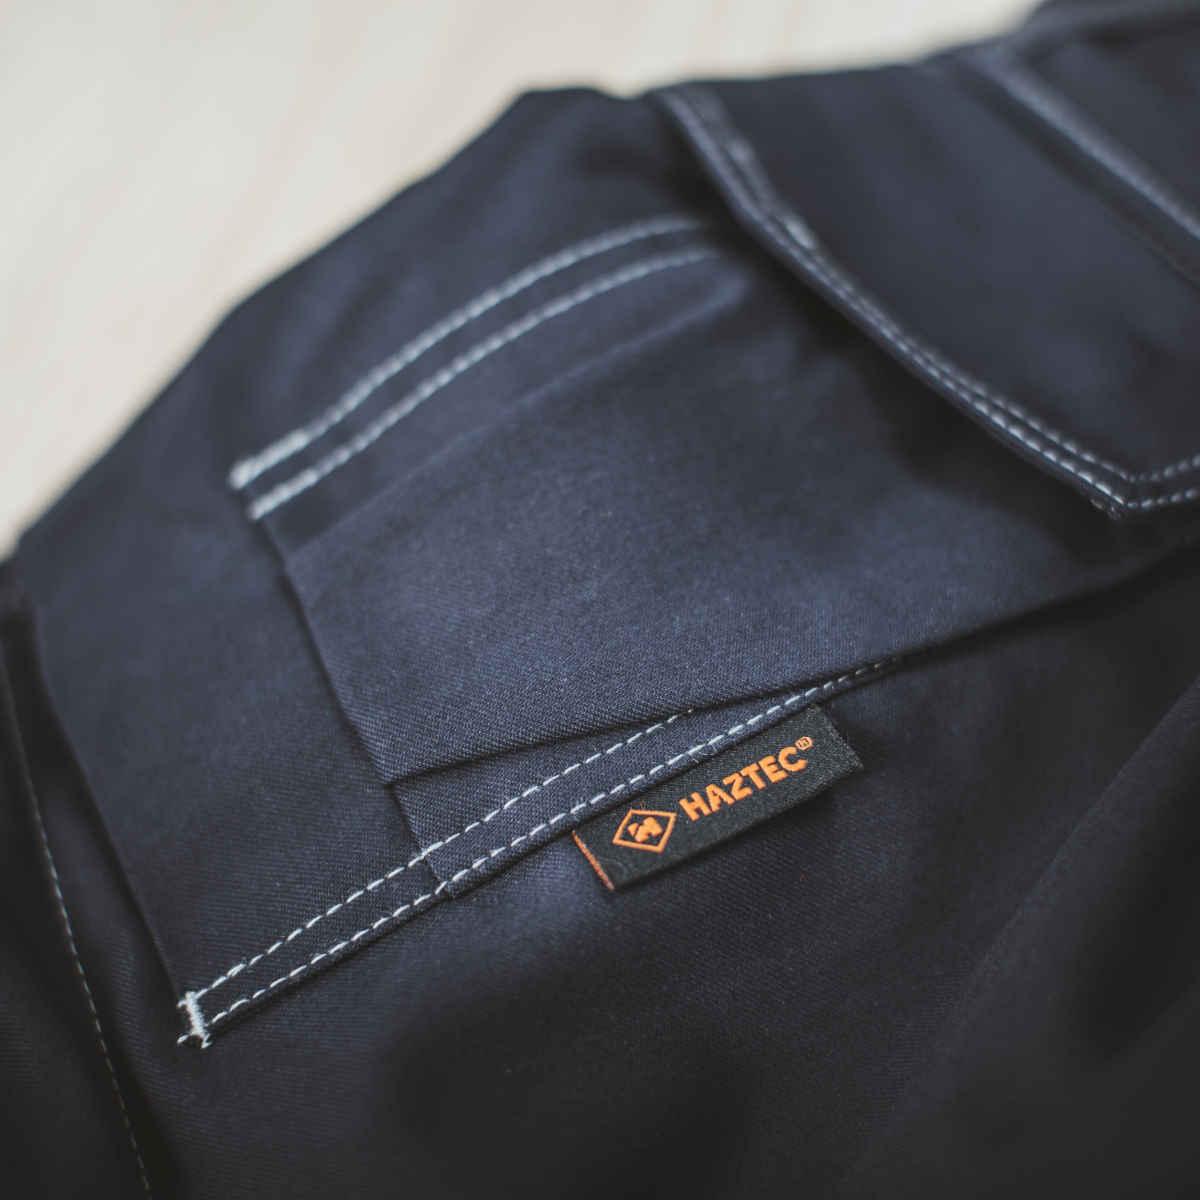 AS0065 HAZTEC Kilmar FR AS Trouser - Rear Pocket